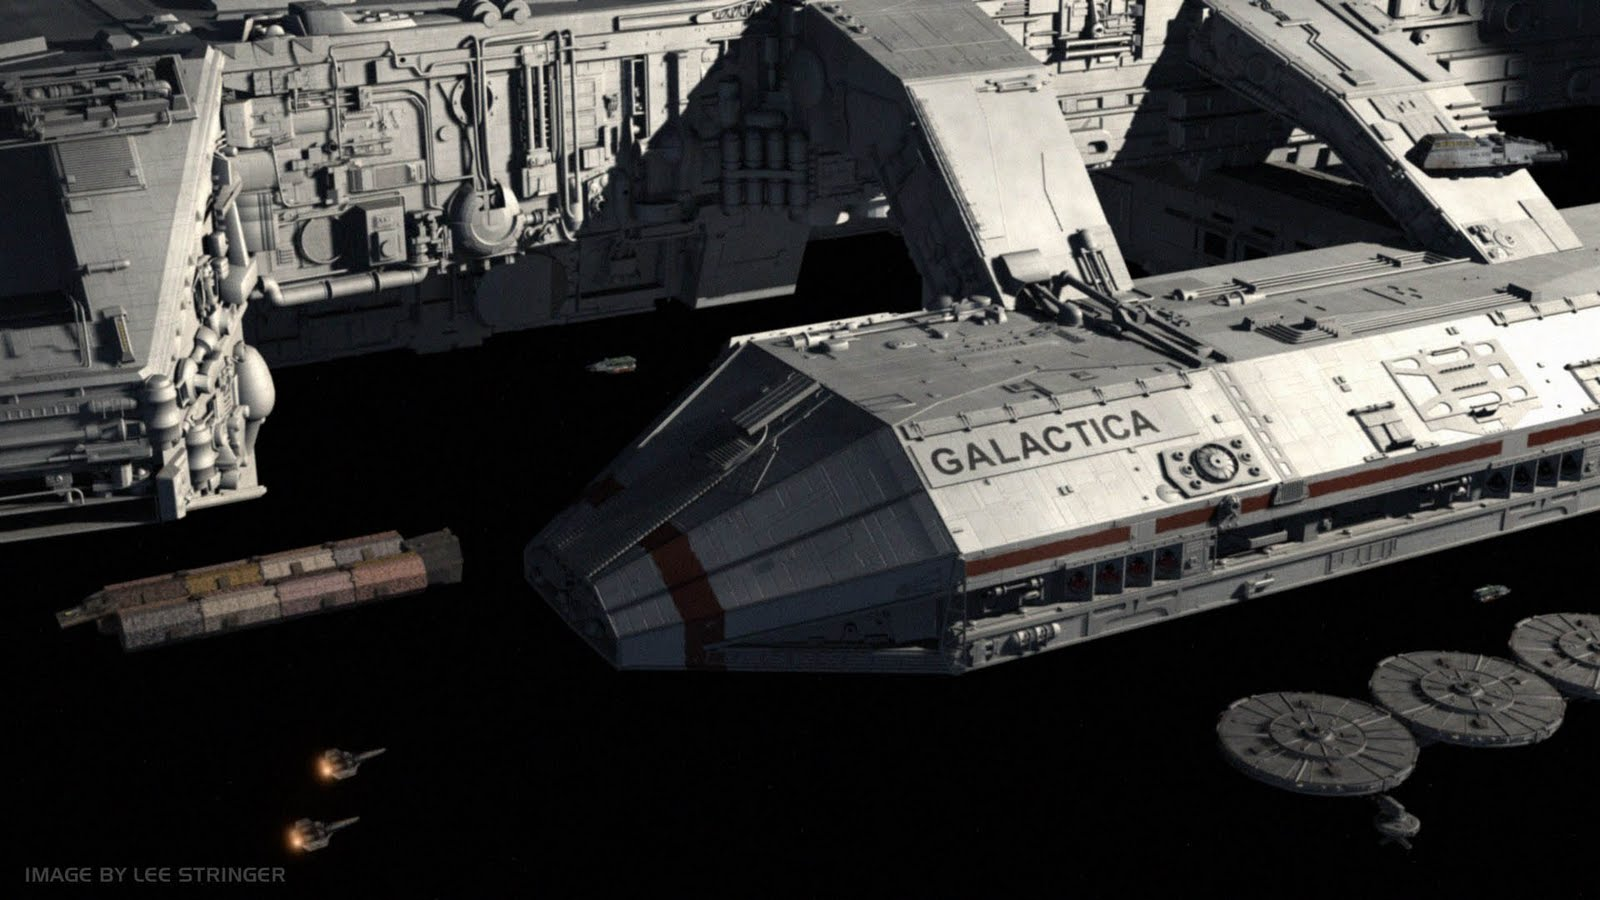 Love U Wallpapers Battlestar Galactica Wallpaper